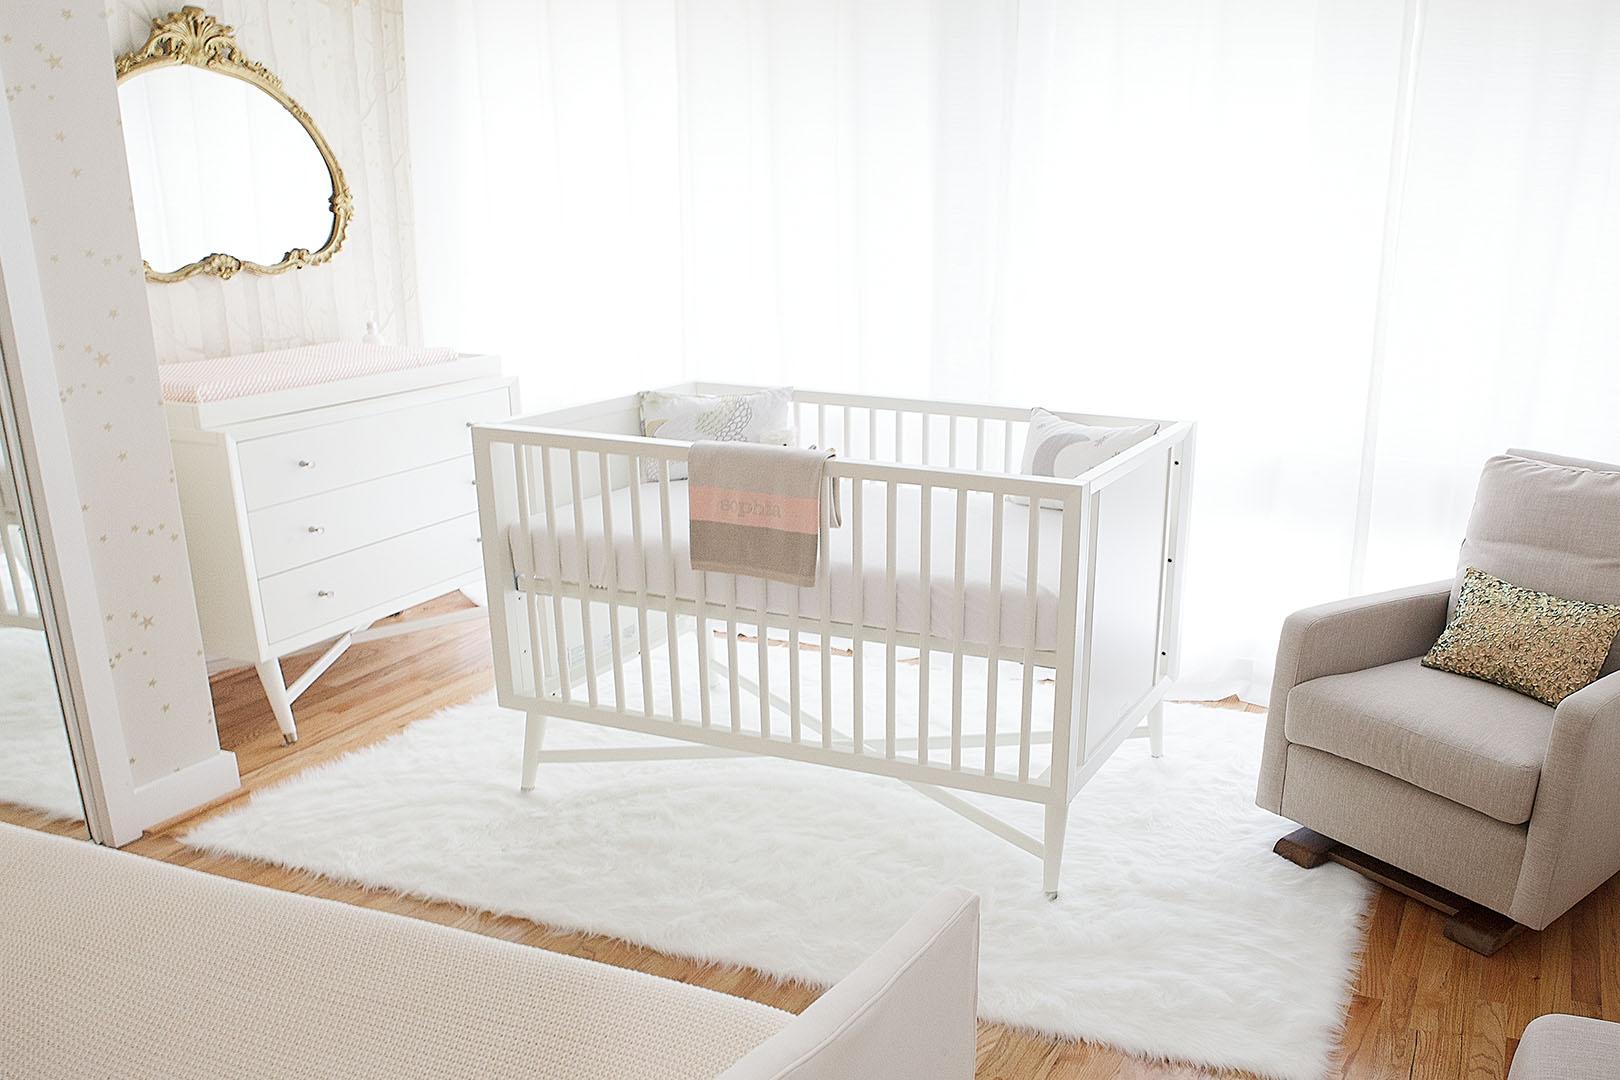 Baby bed design in Oakland, CA